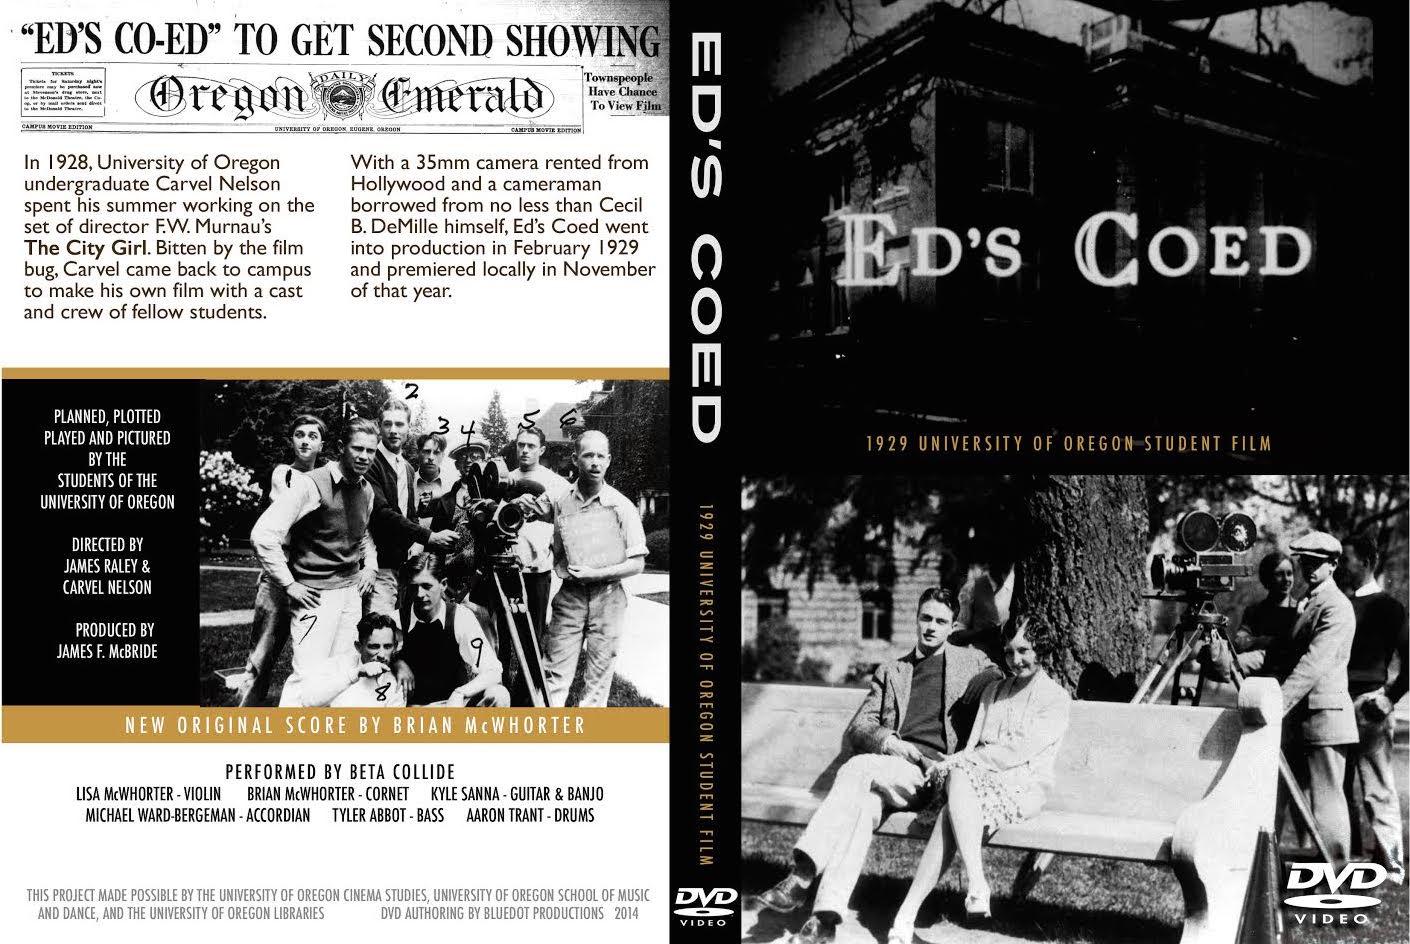 ed's coed cover